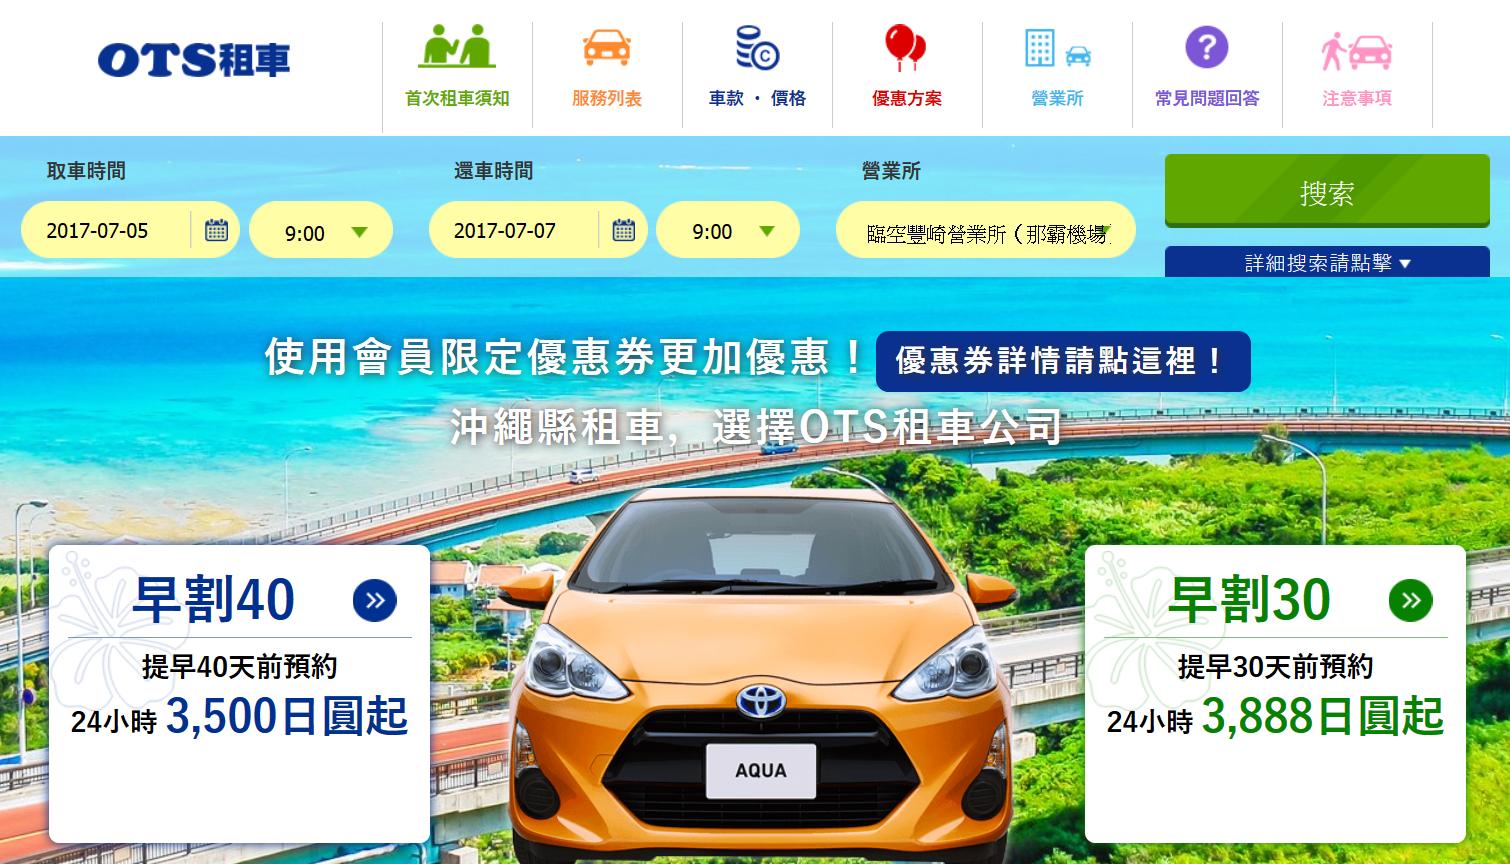 OTS-%25E6%25B2%2596%25E7%25B9%25A9-%25E7%25A7%259F%25E8%25BB%258A-%25E8%2587%25AA%25E9%25A7%2595-%25E6%258E%25A8%25E8%2596%25A6-Okinawa-rental-car-沖繩-租車-自駕-推薦-比價